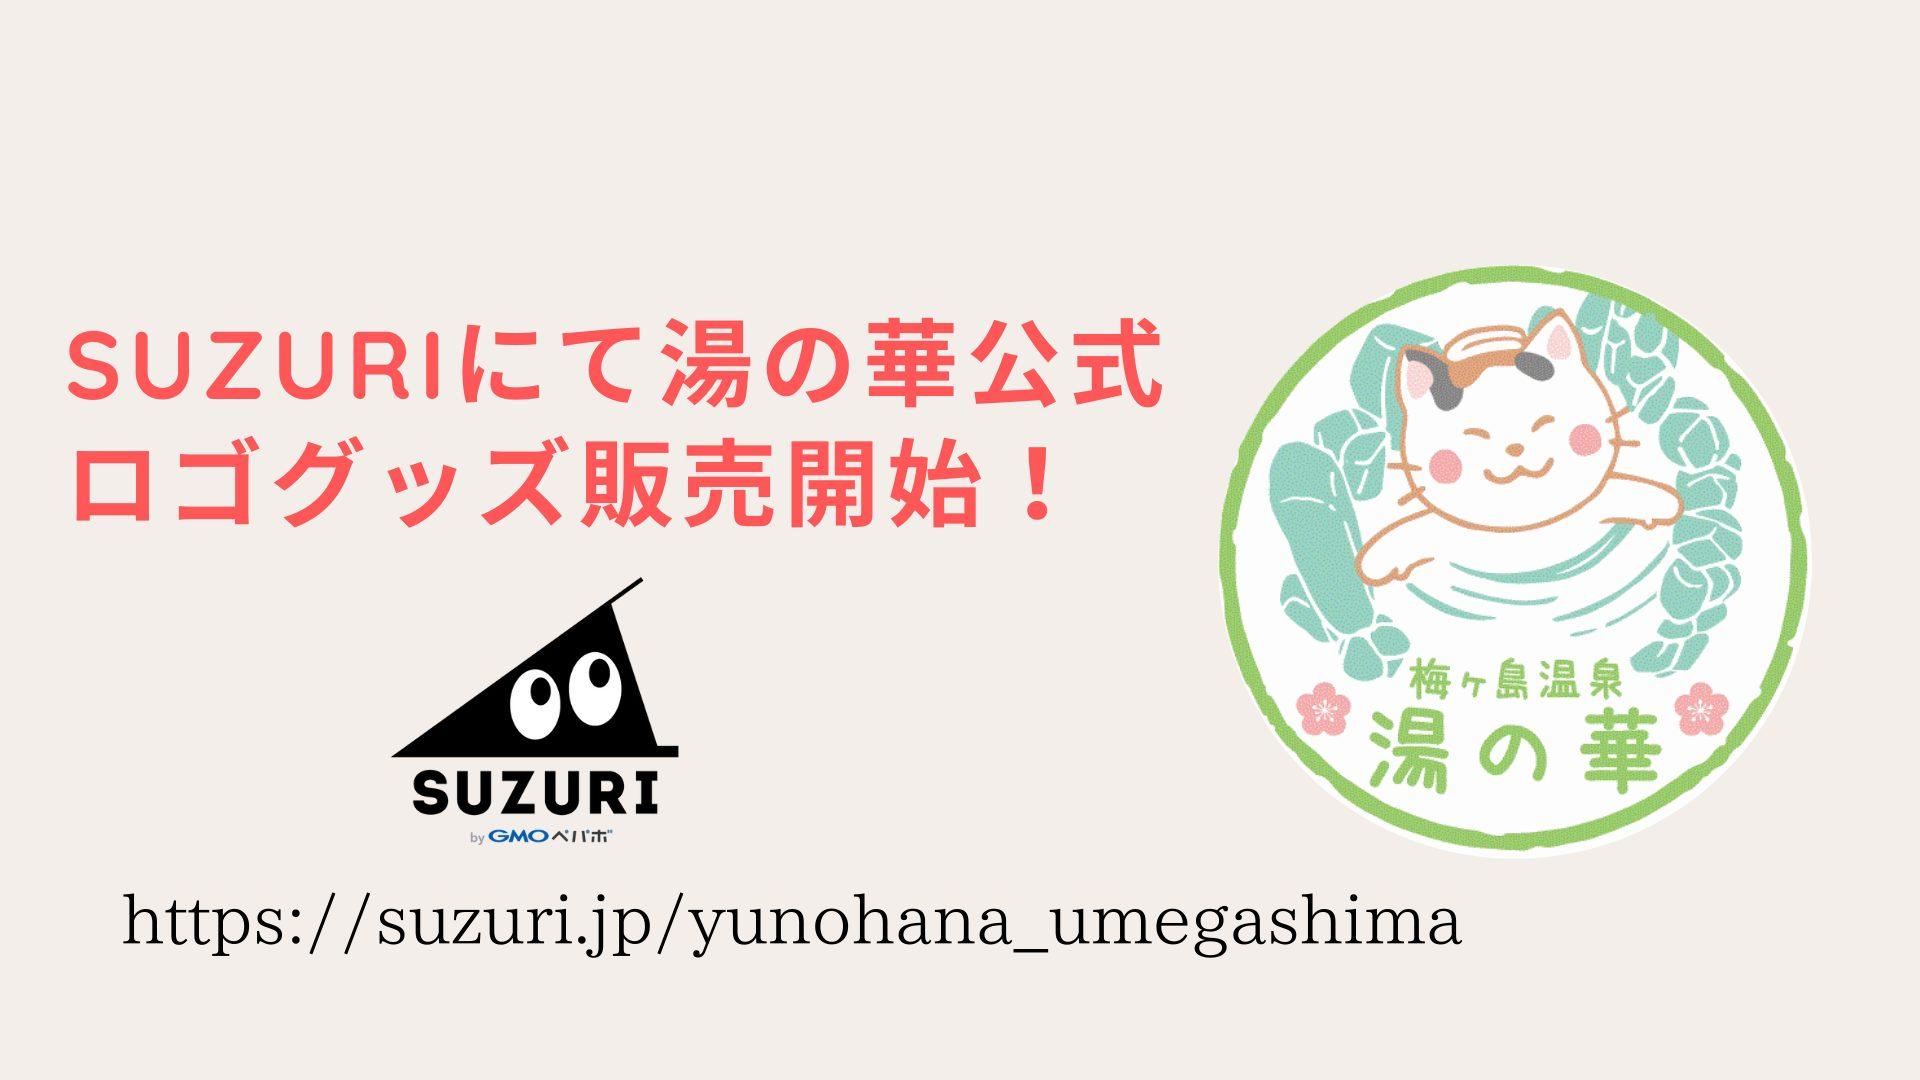 SUZURIにて湯の華公式ロゴグッズ販売開始!